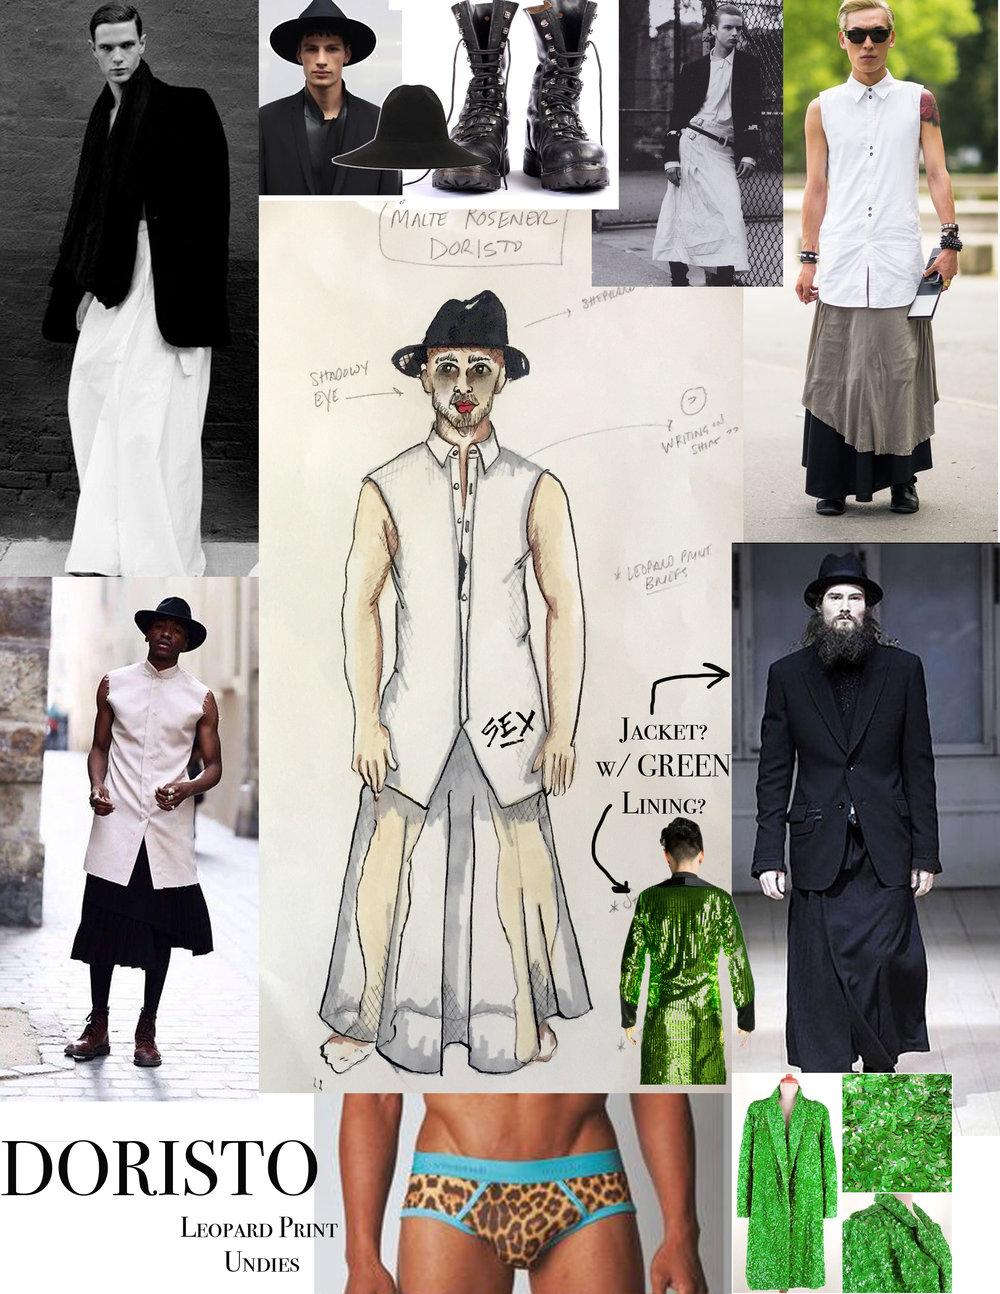 Doristo collage.jpg